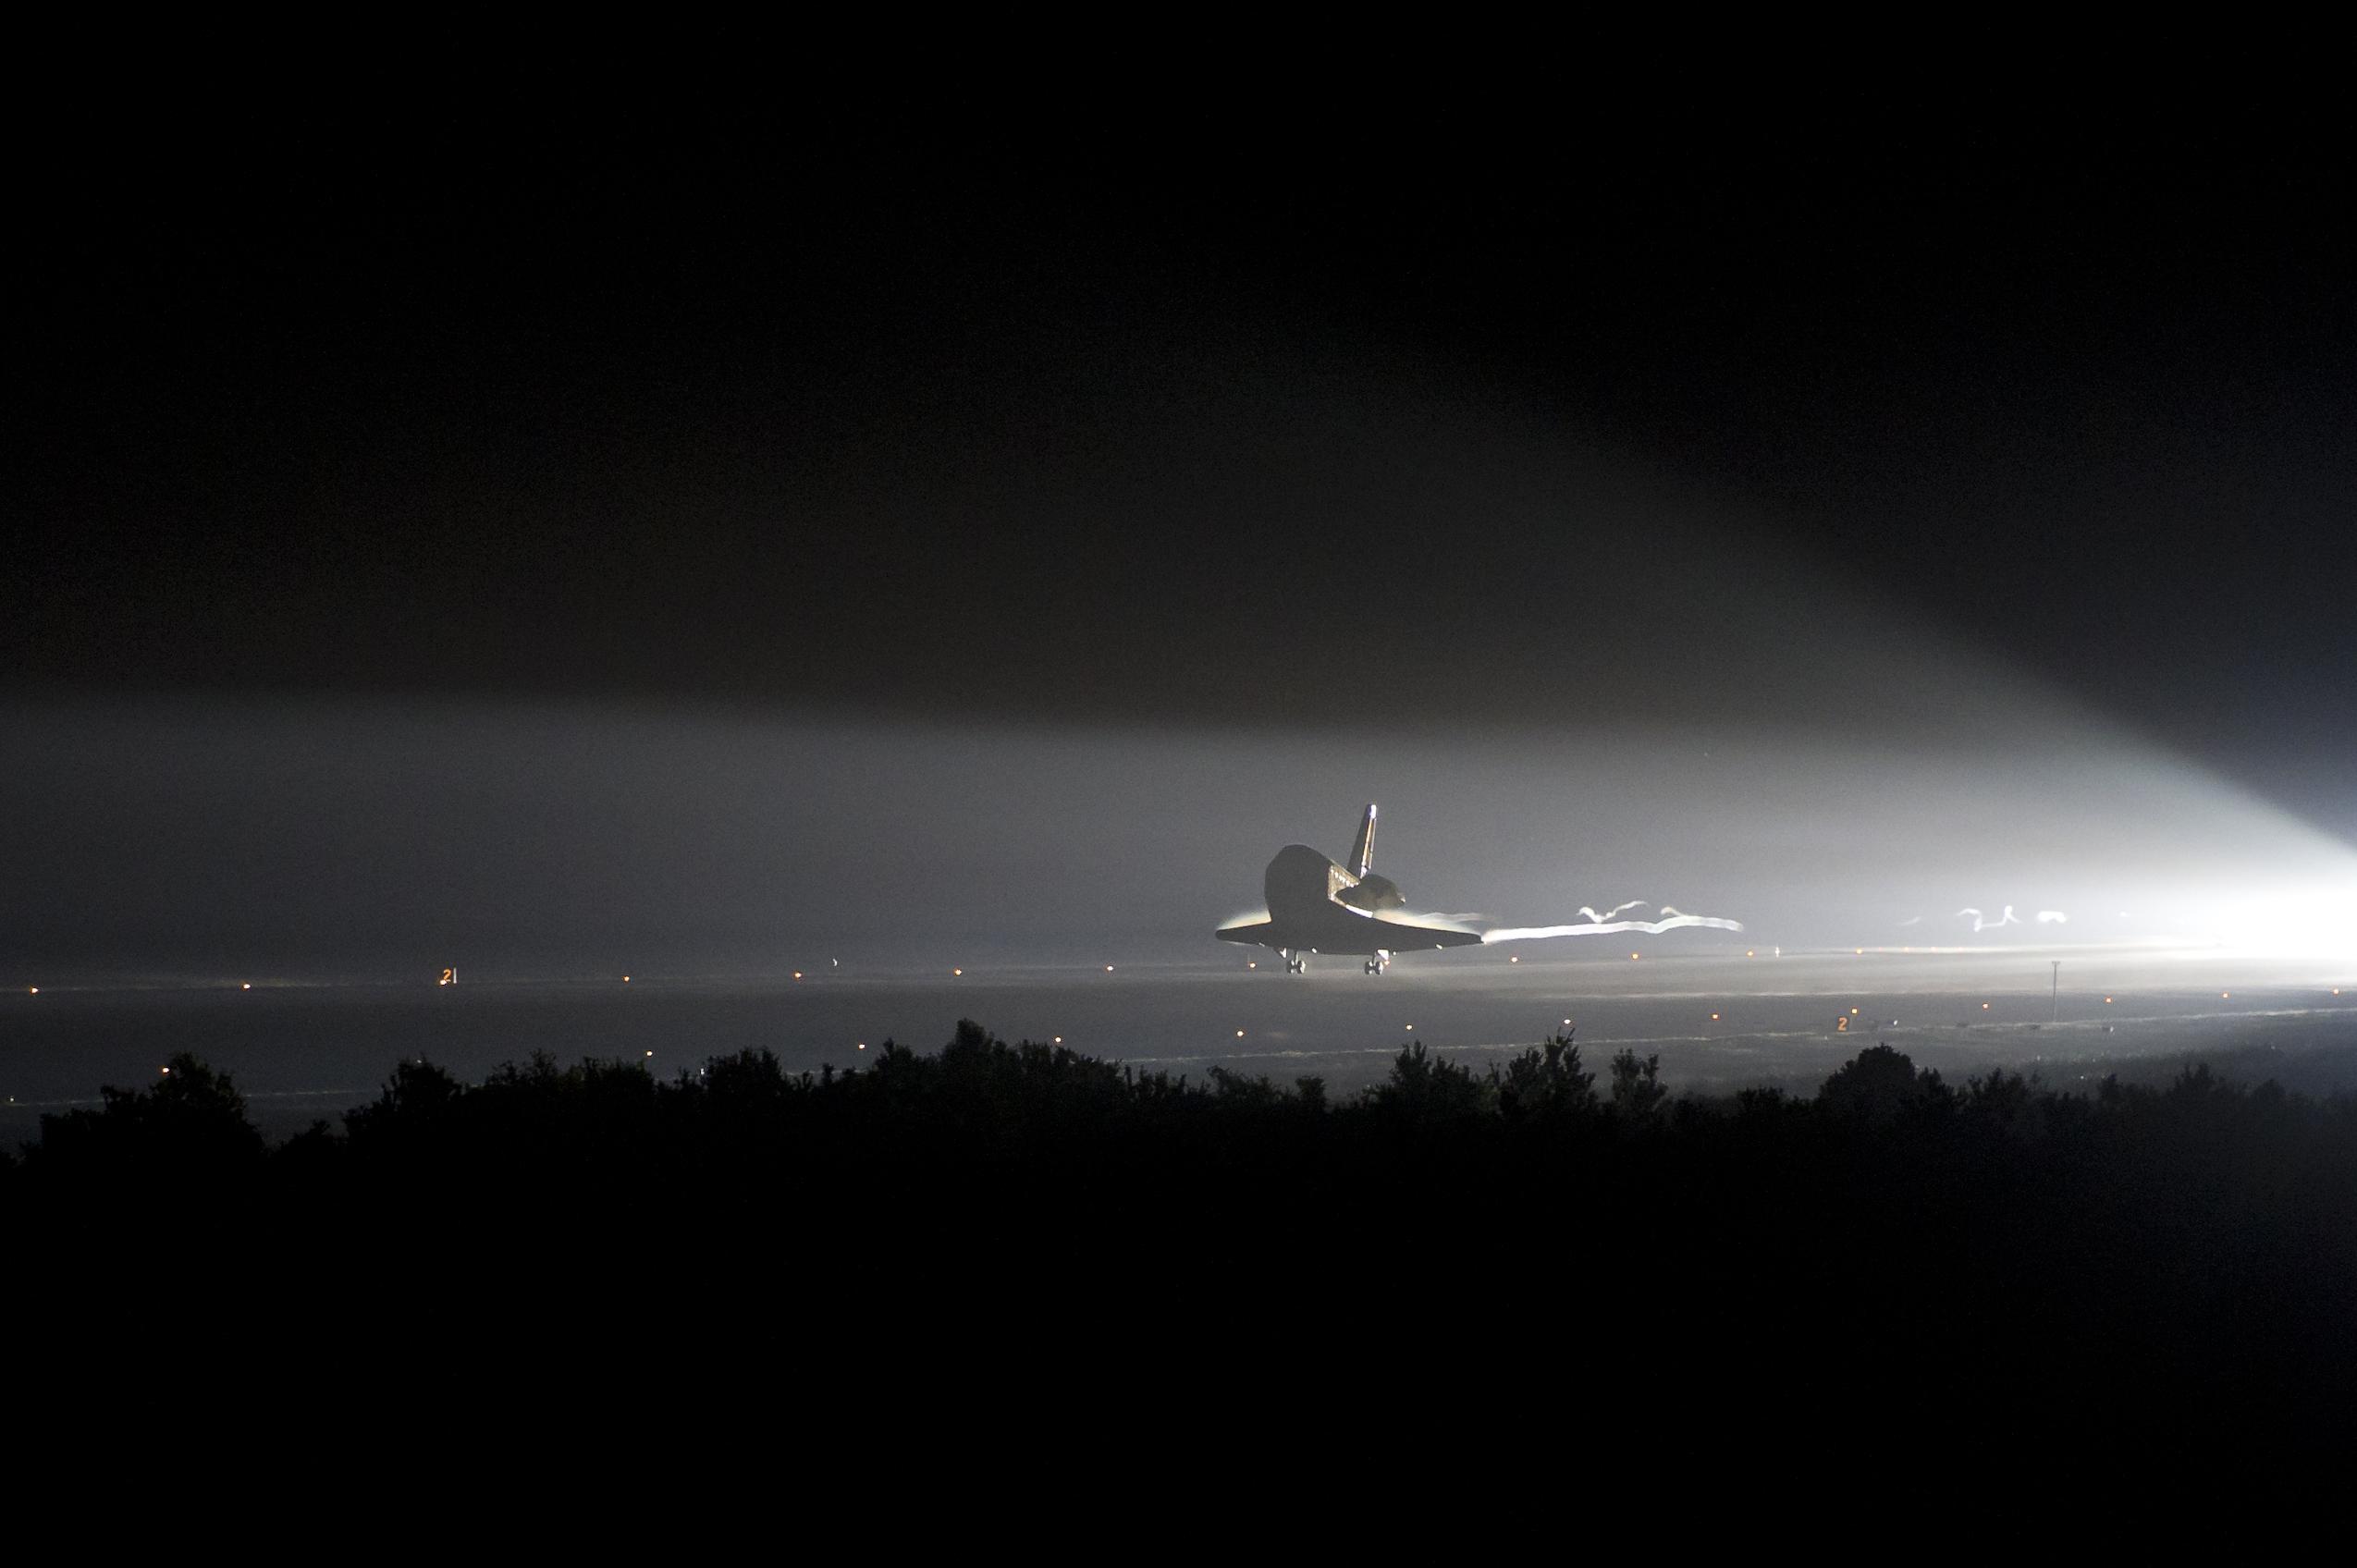 space shuttle landing at night - photo #14